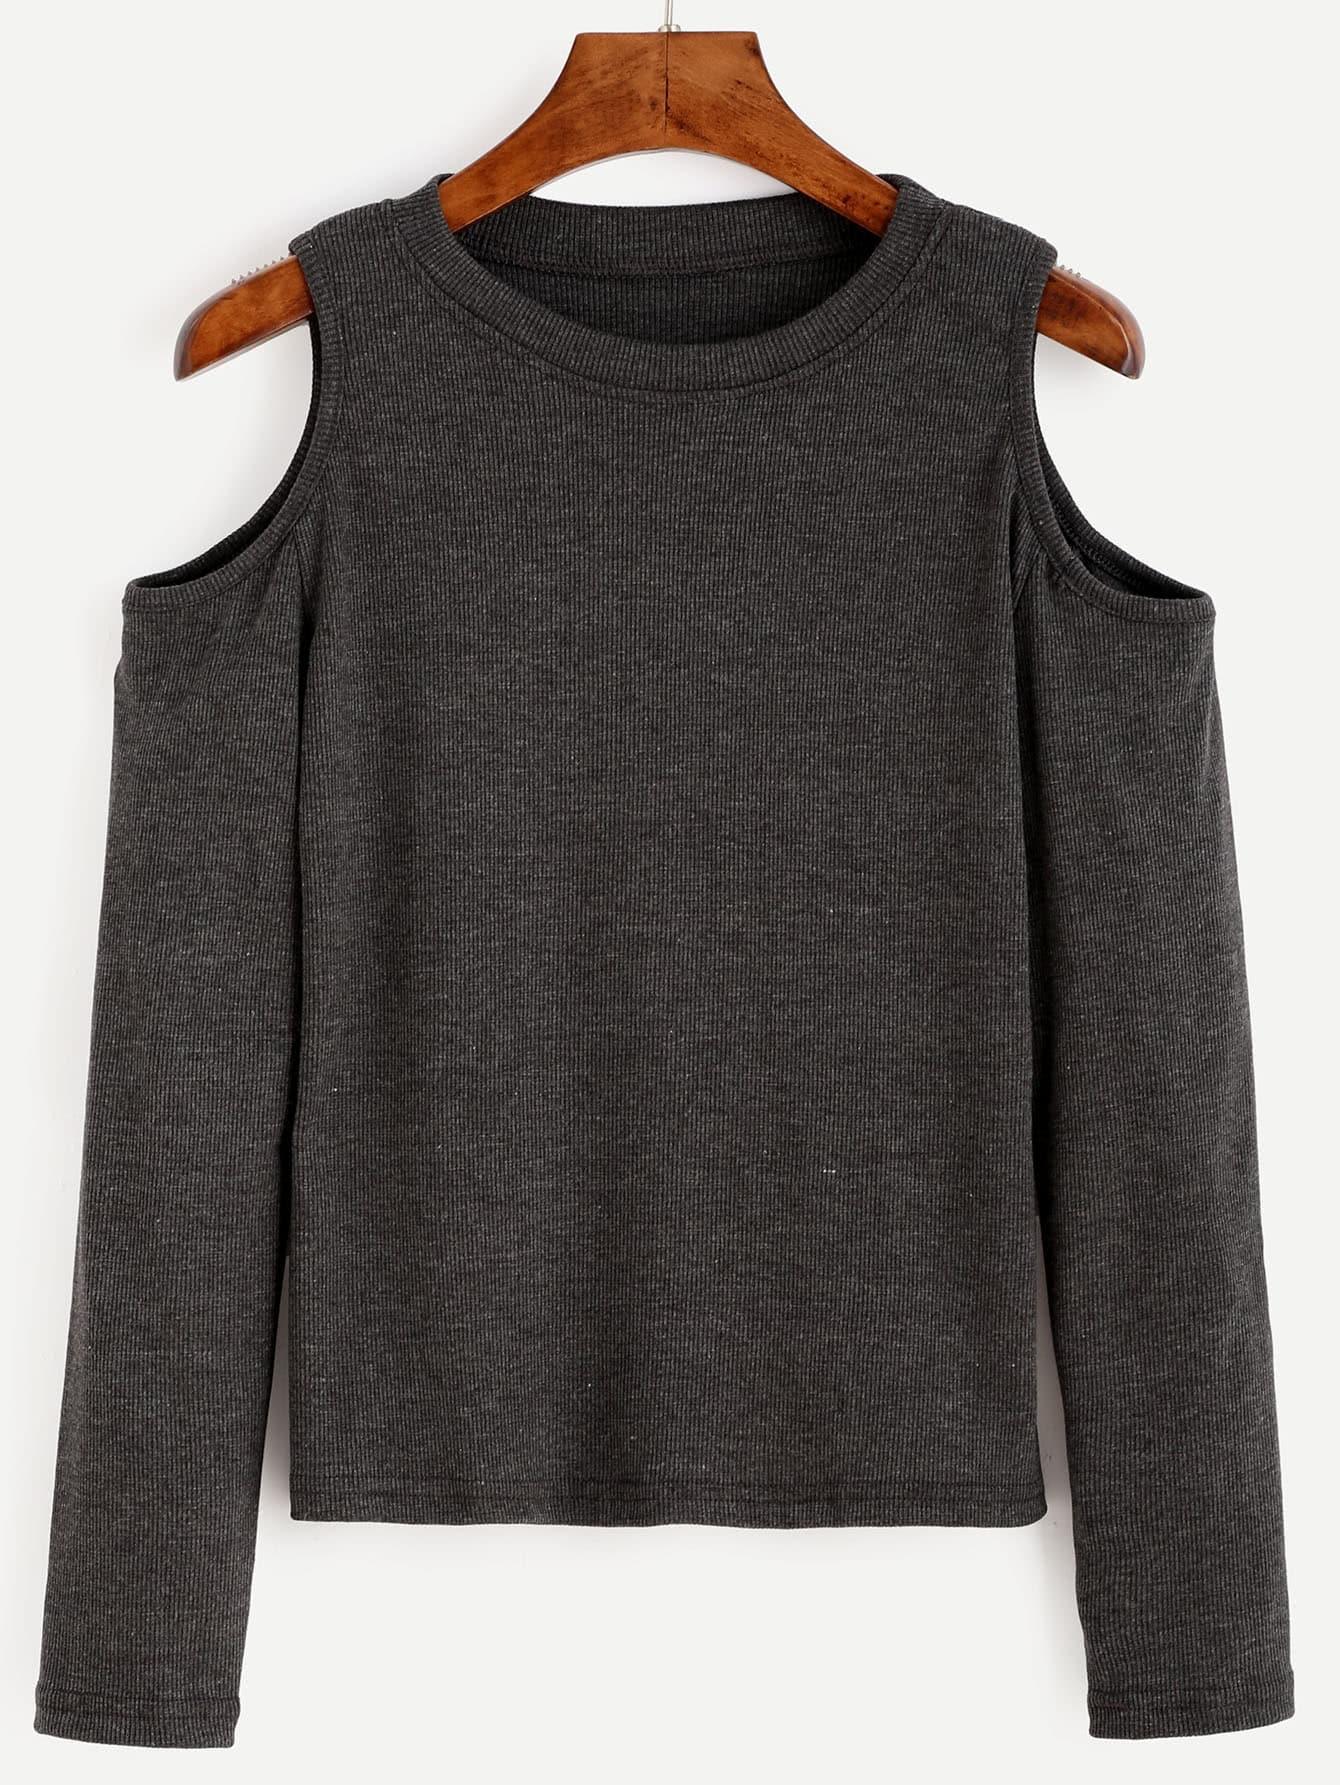 Open Shoulder Rib Knit Tee RTSH160803127